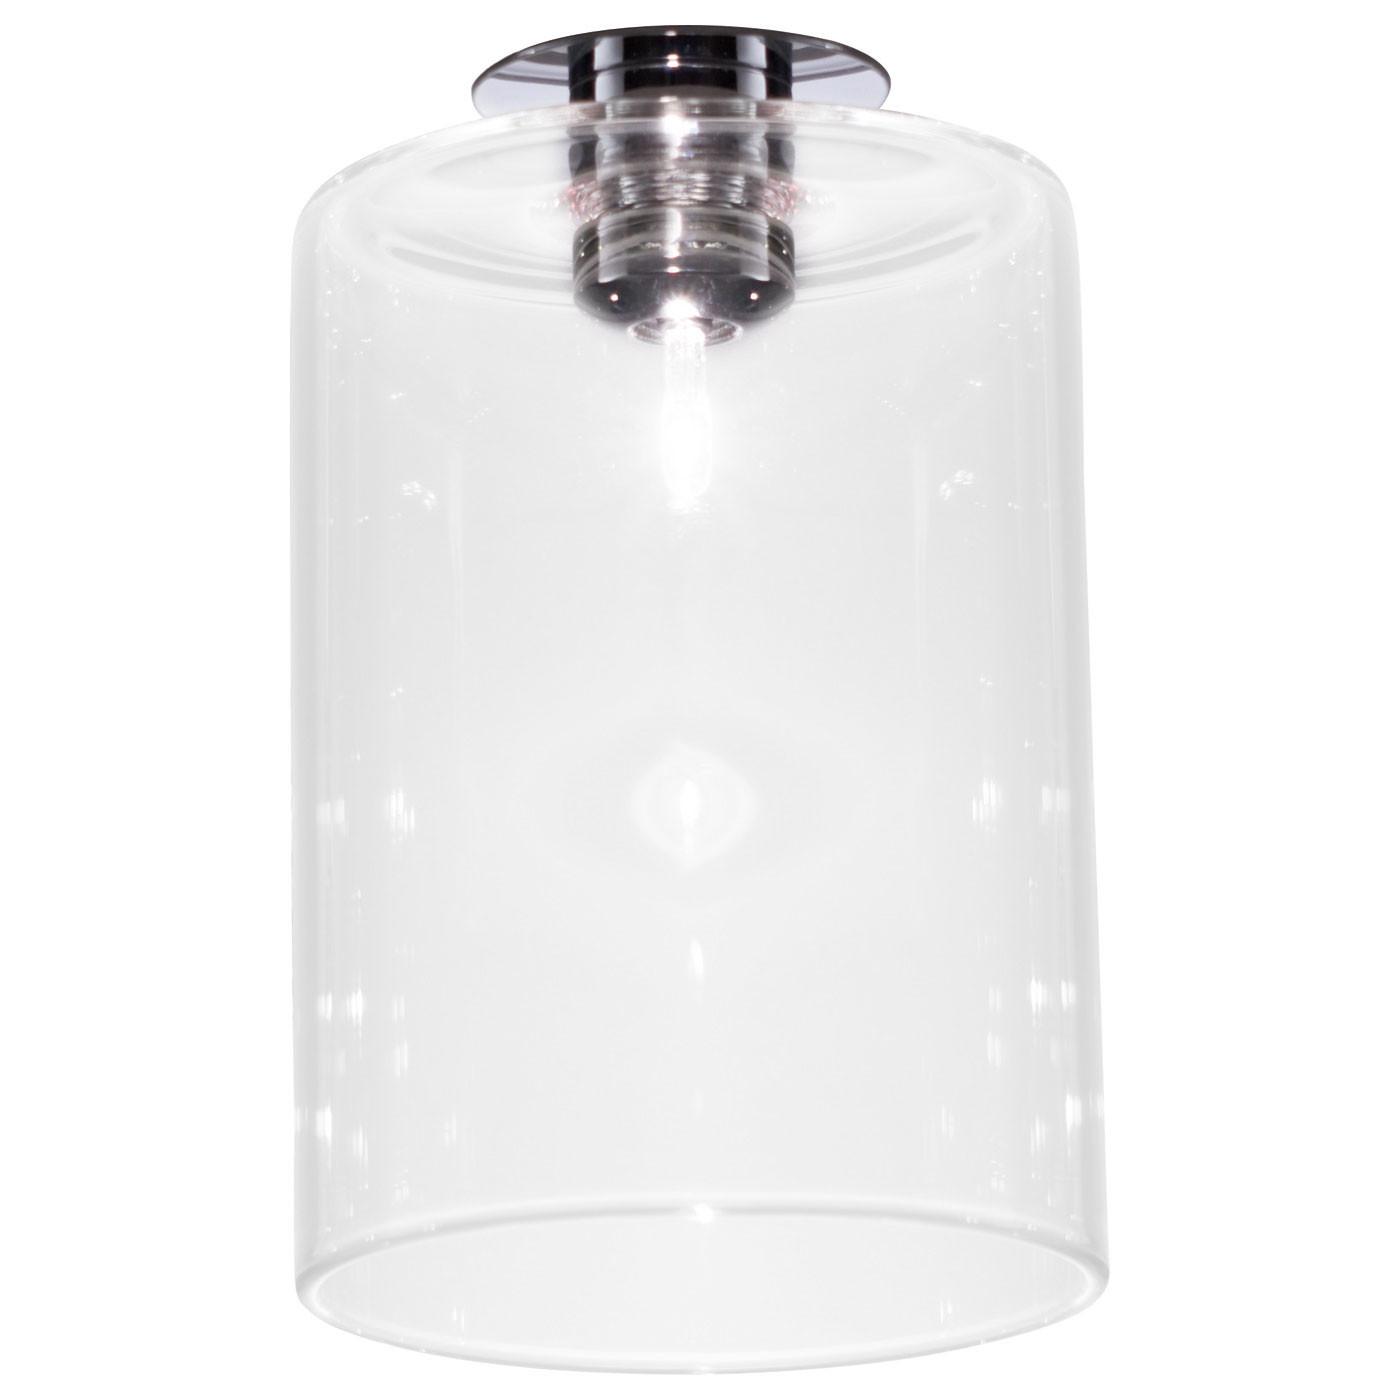 Axo Light Spillray PL P I